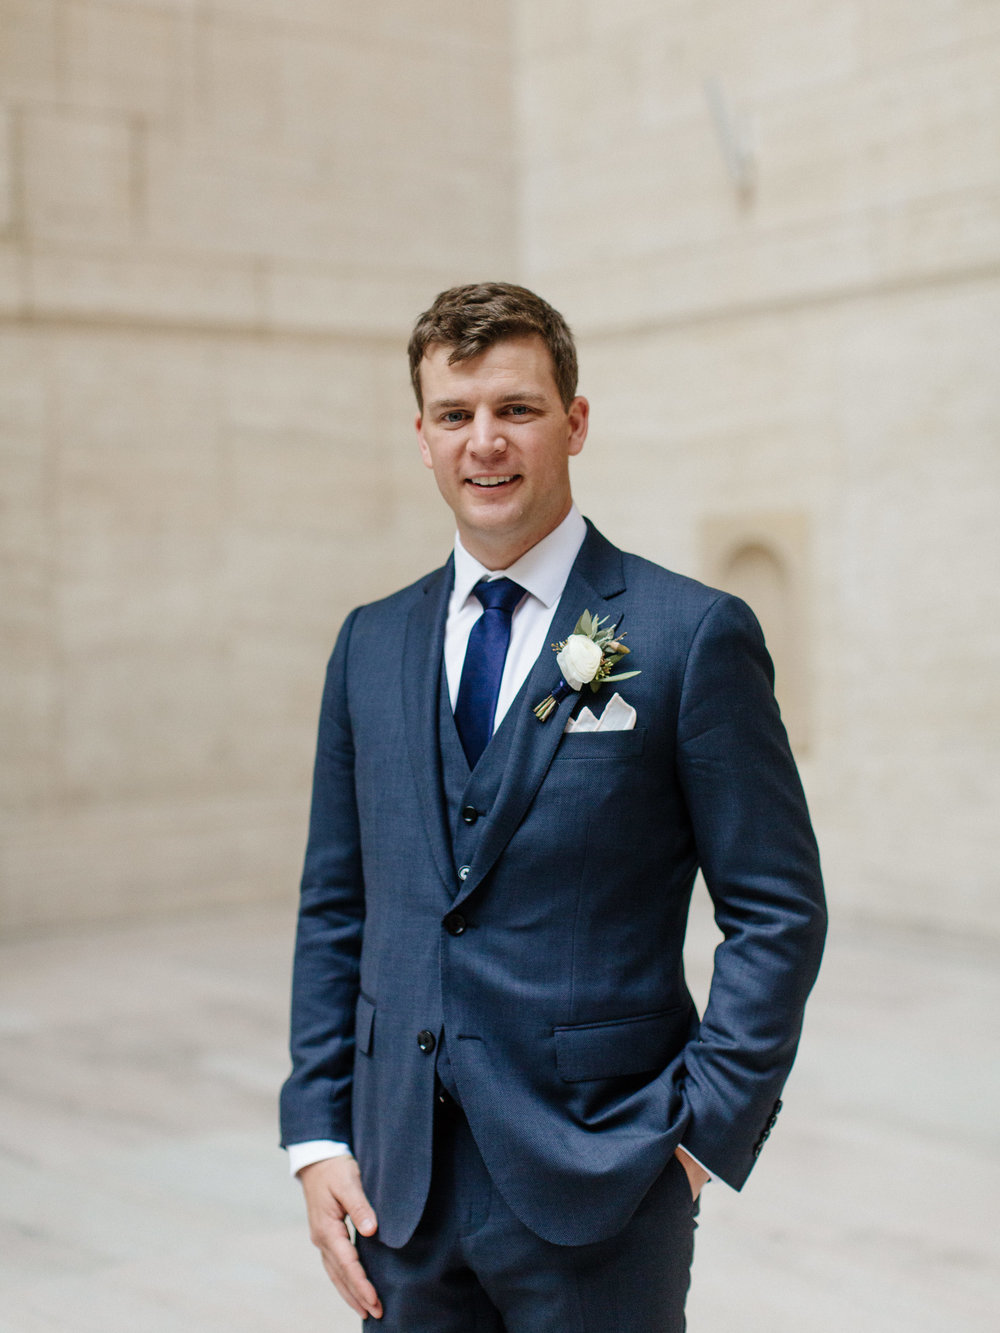 chicago-illuminating-company-wedding-044.jpg